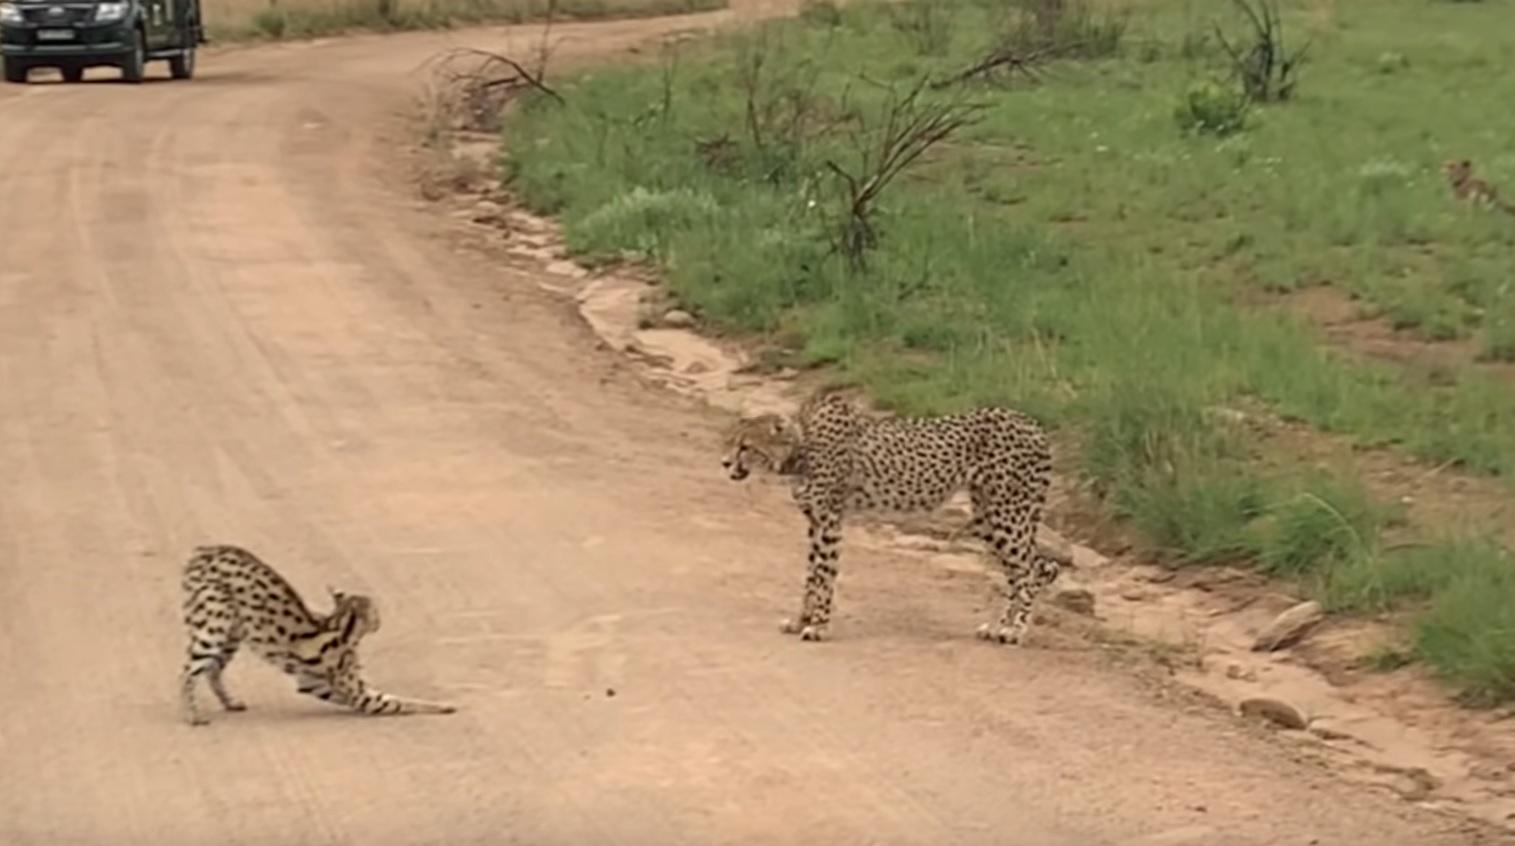 Serval Vs Cheetah Standoff